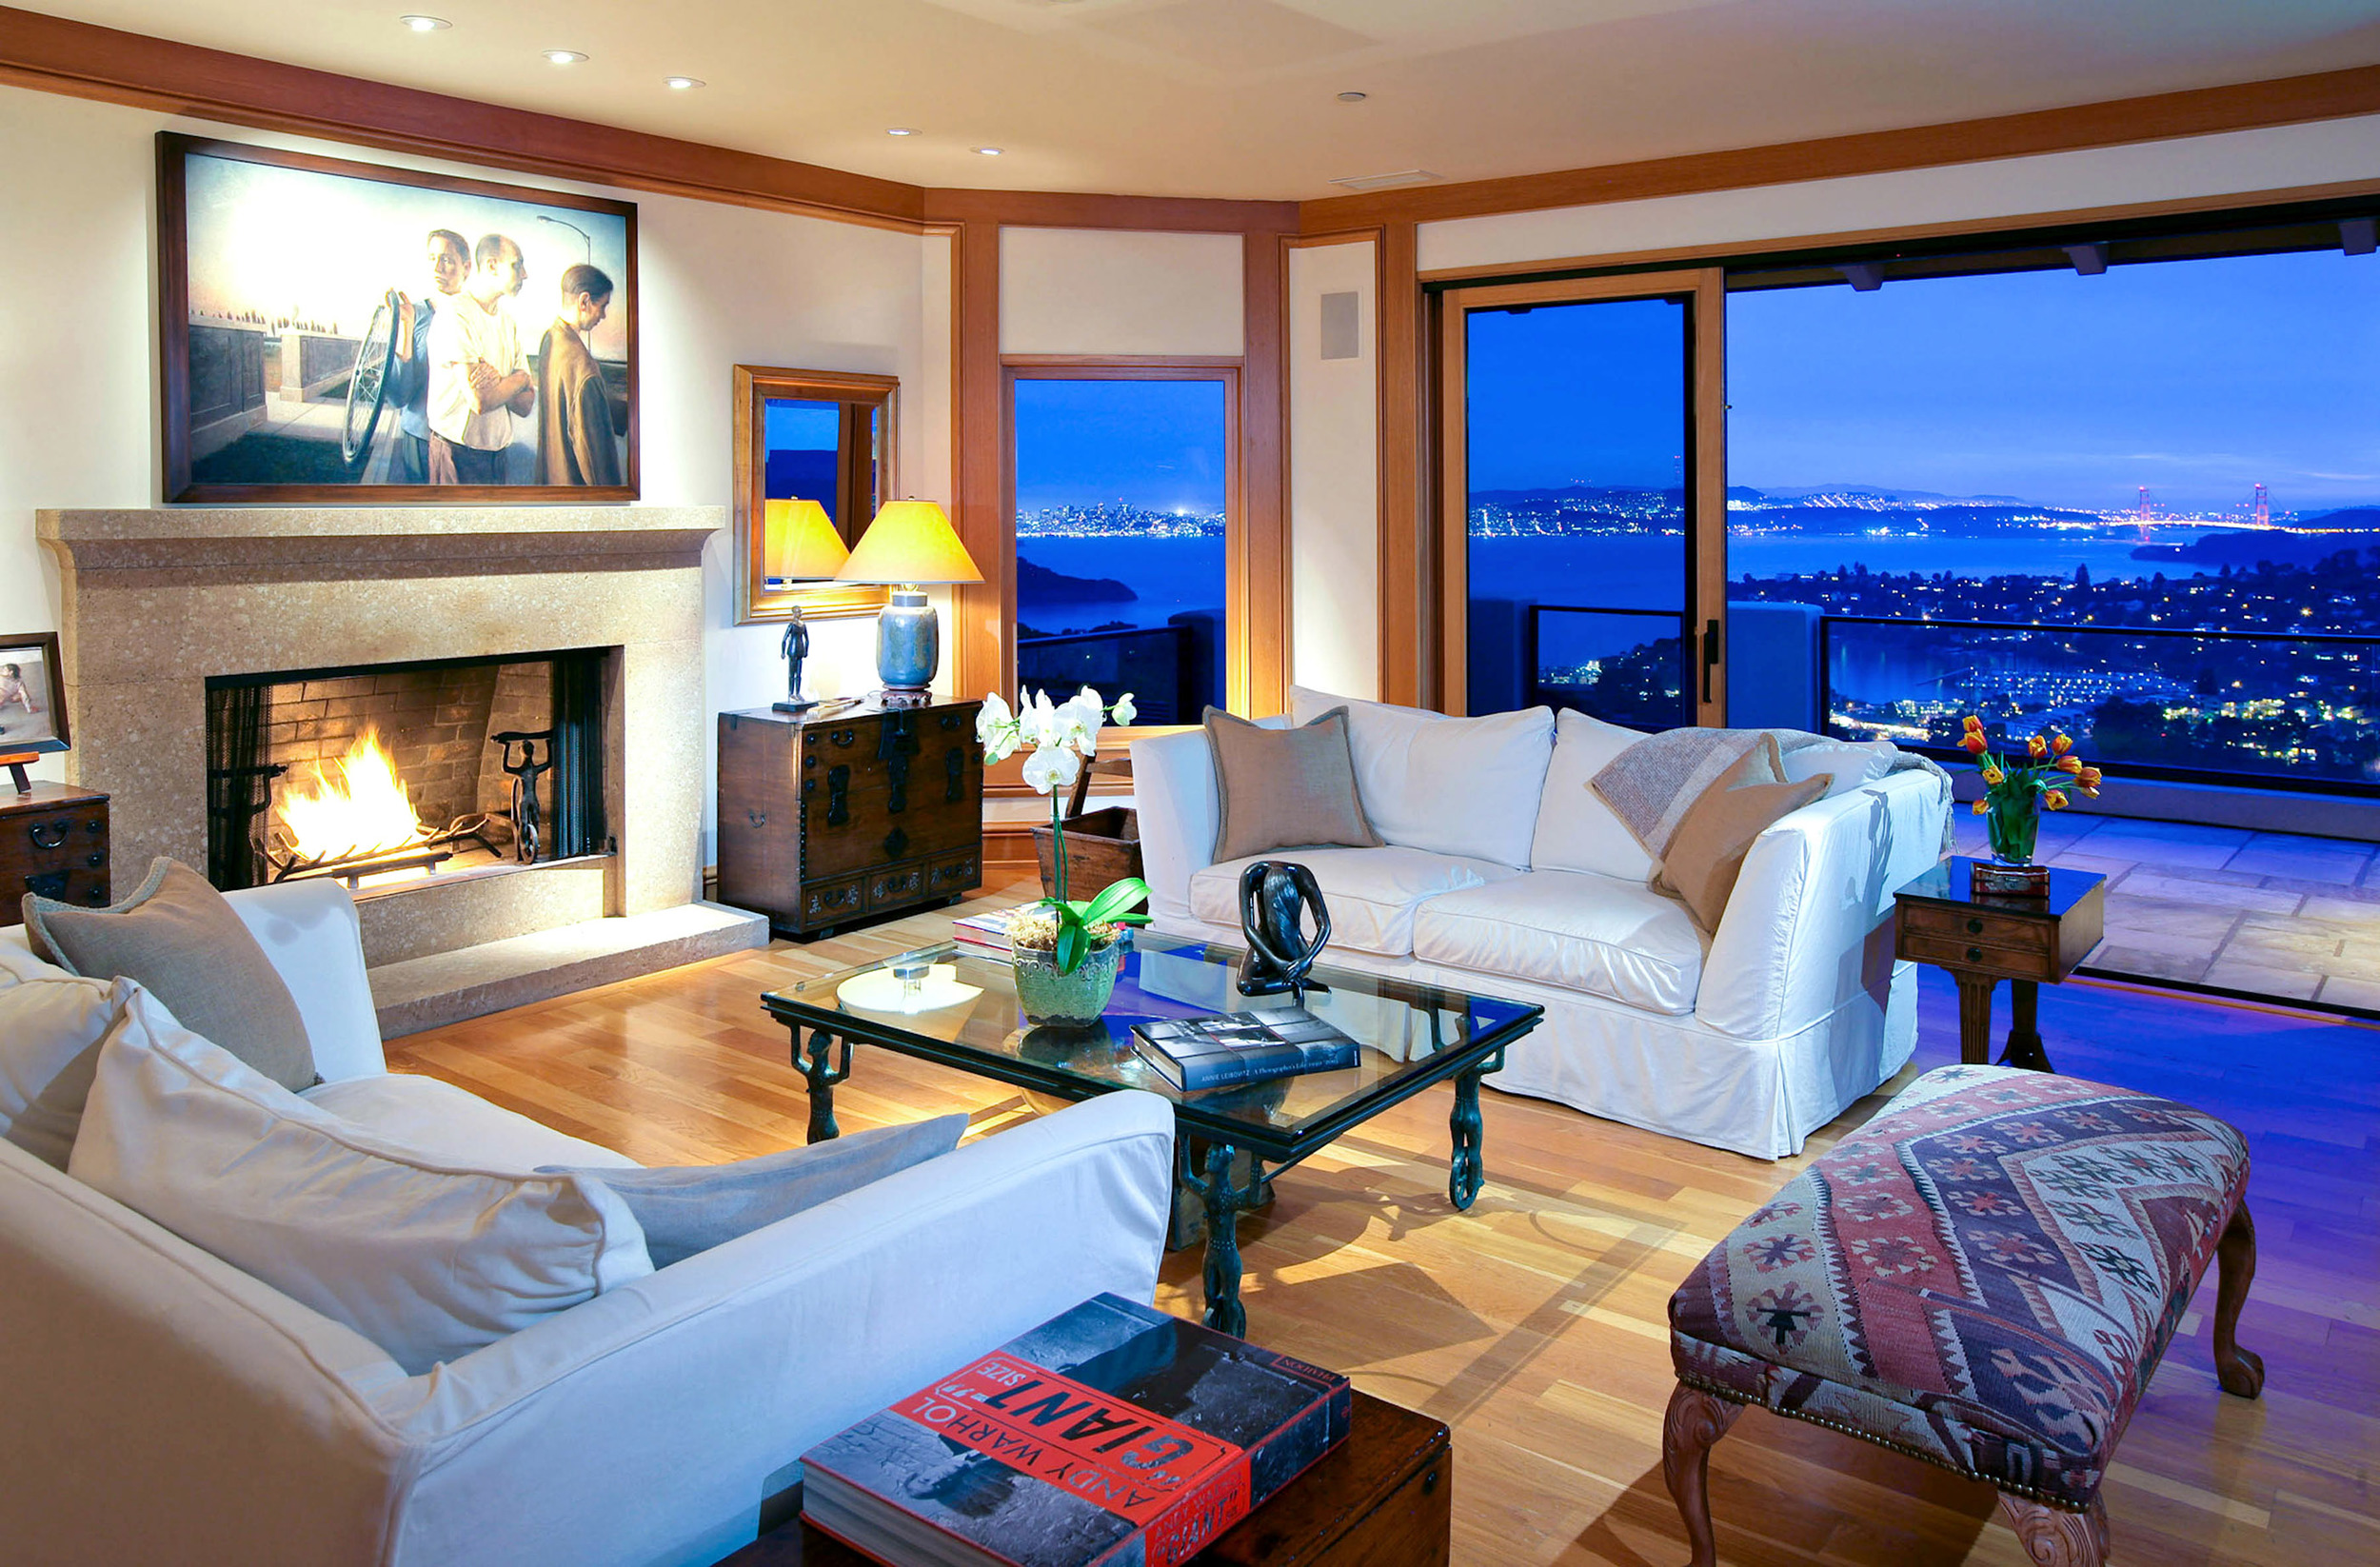 2_bob_morris_interiors_sanfrancisco.jpg